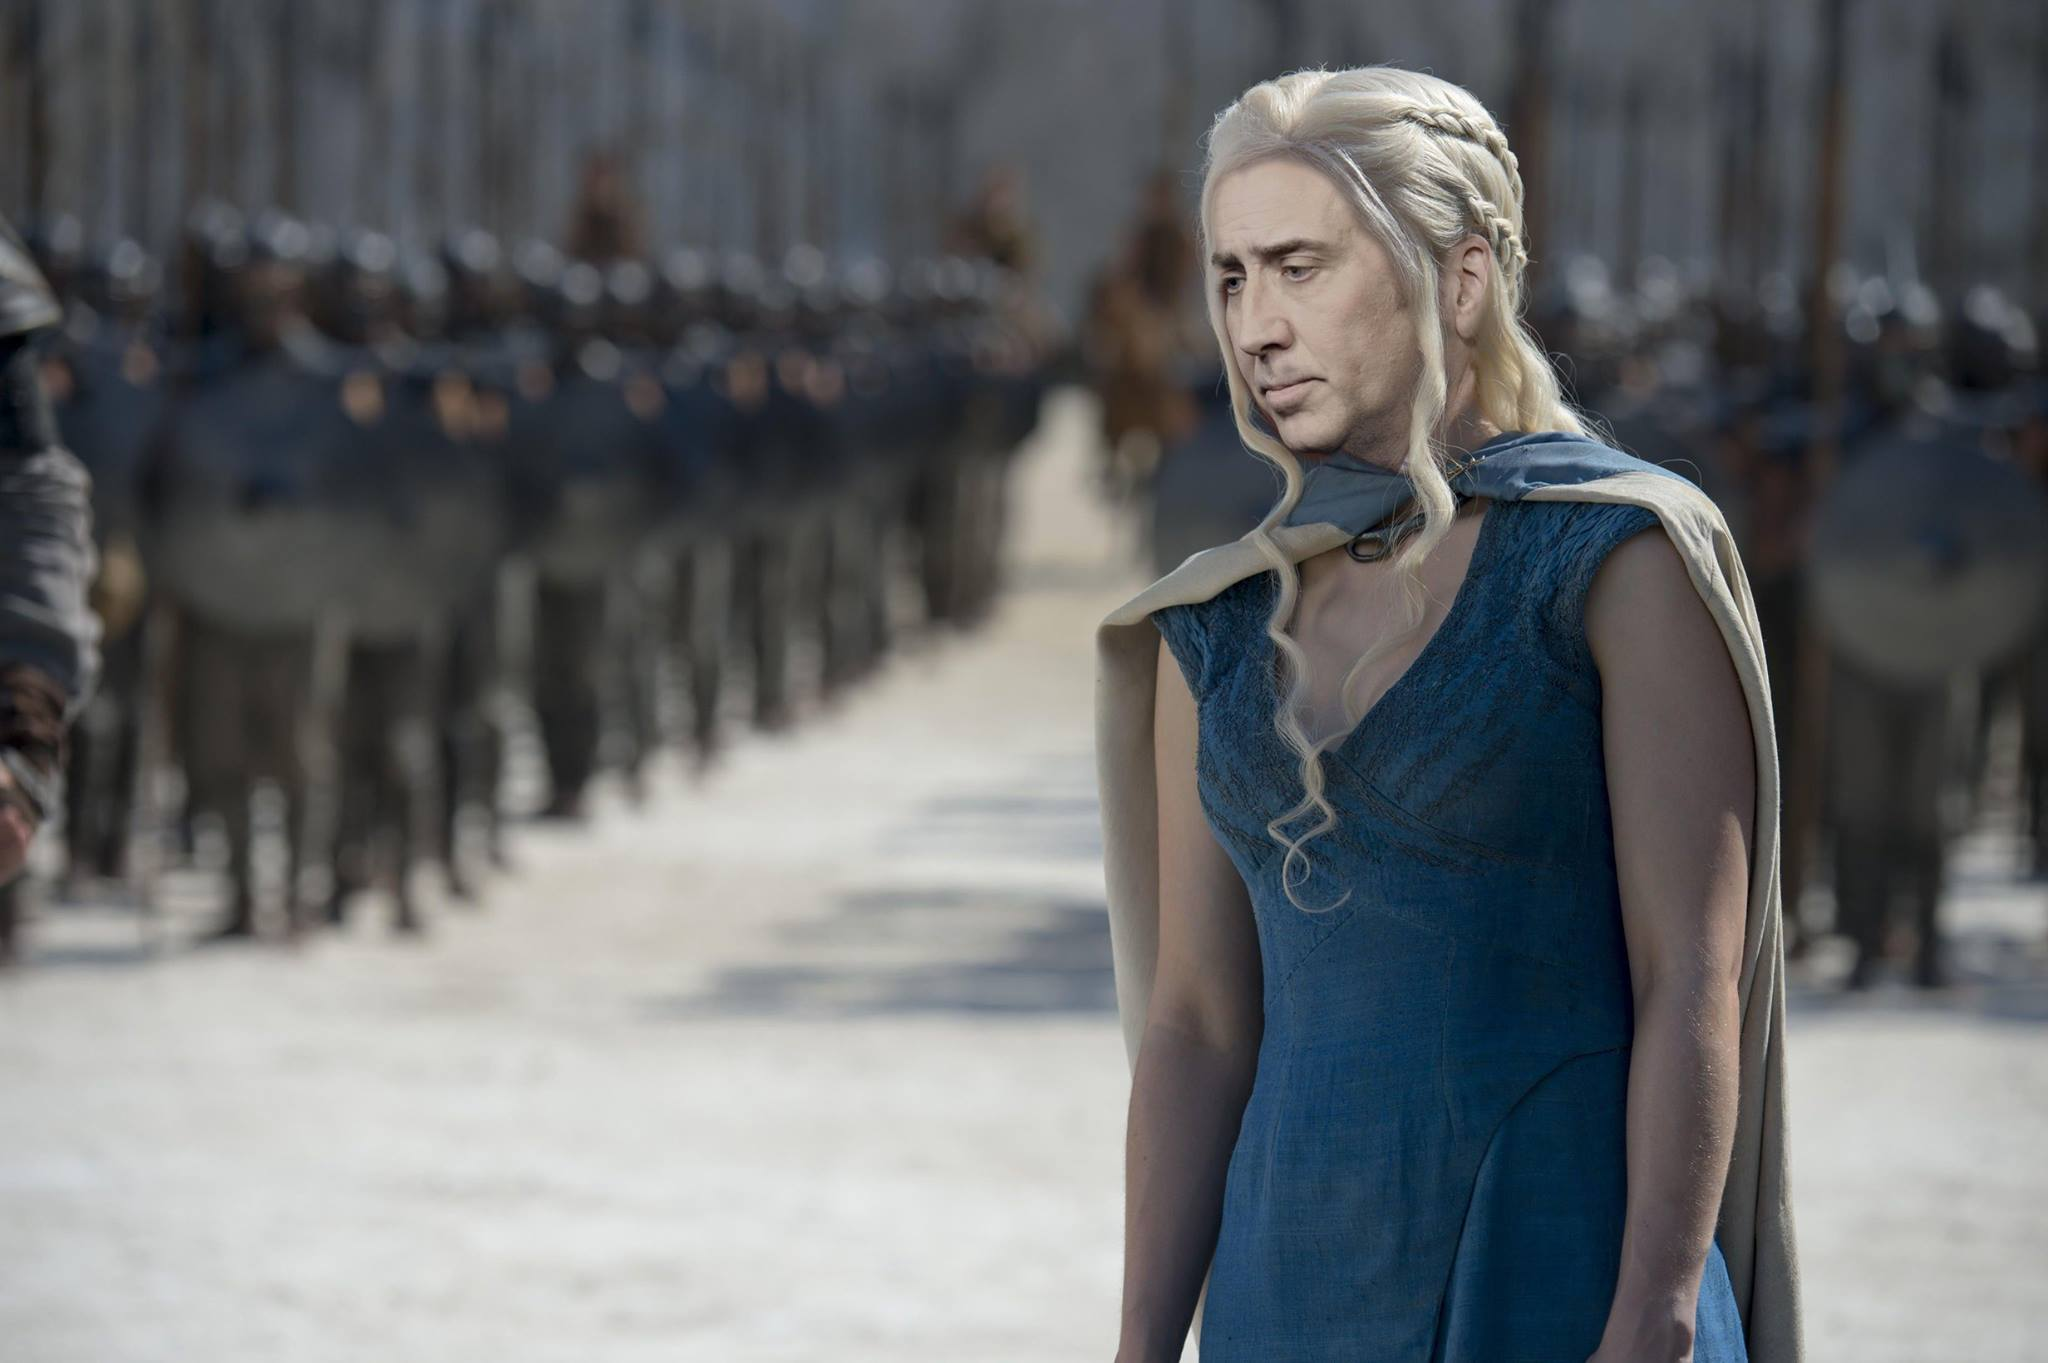 Nick of Thrones